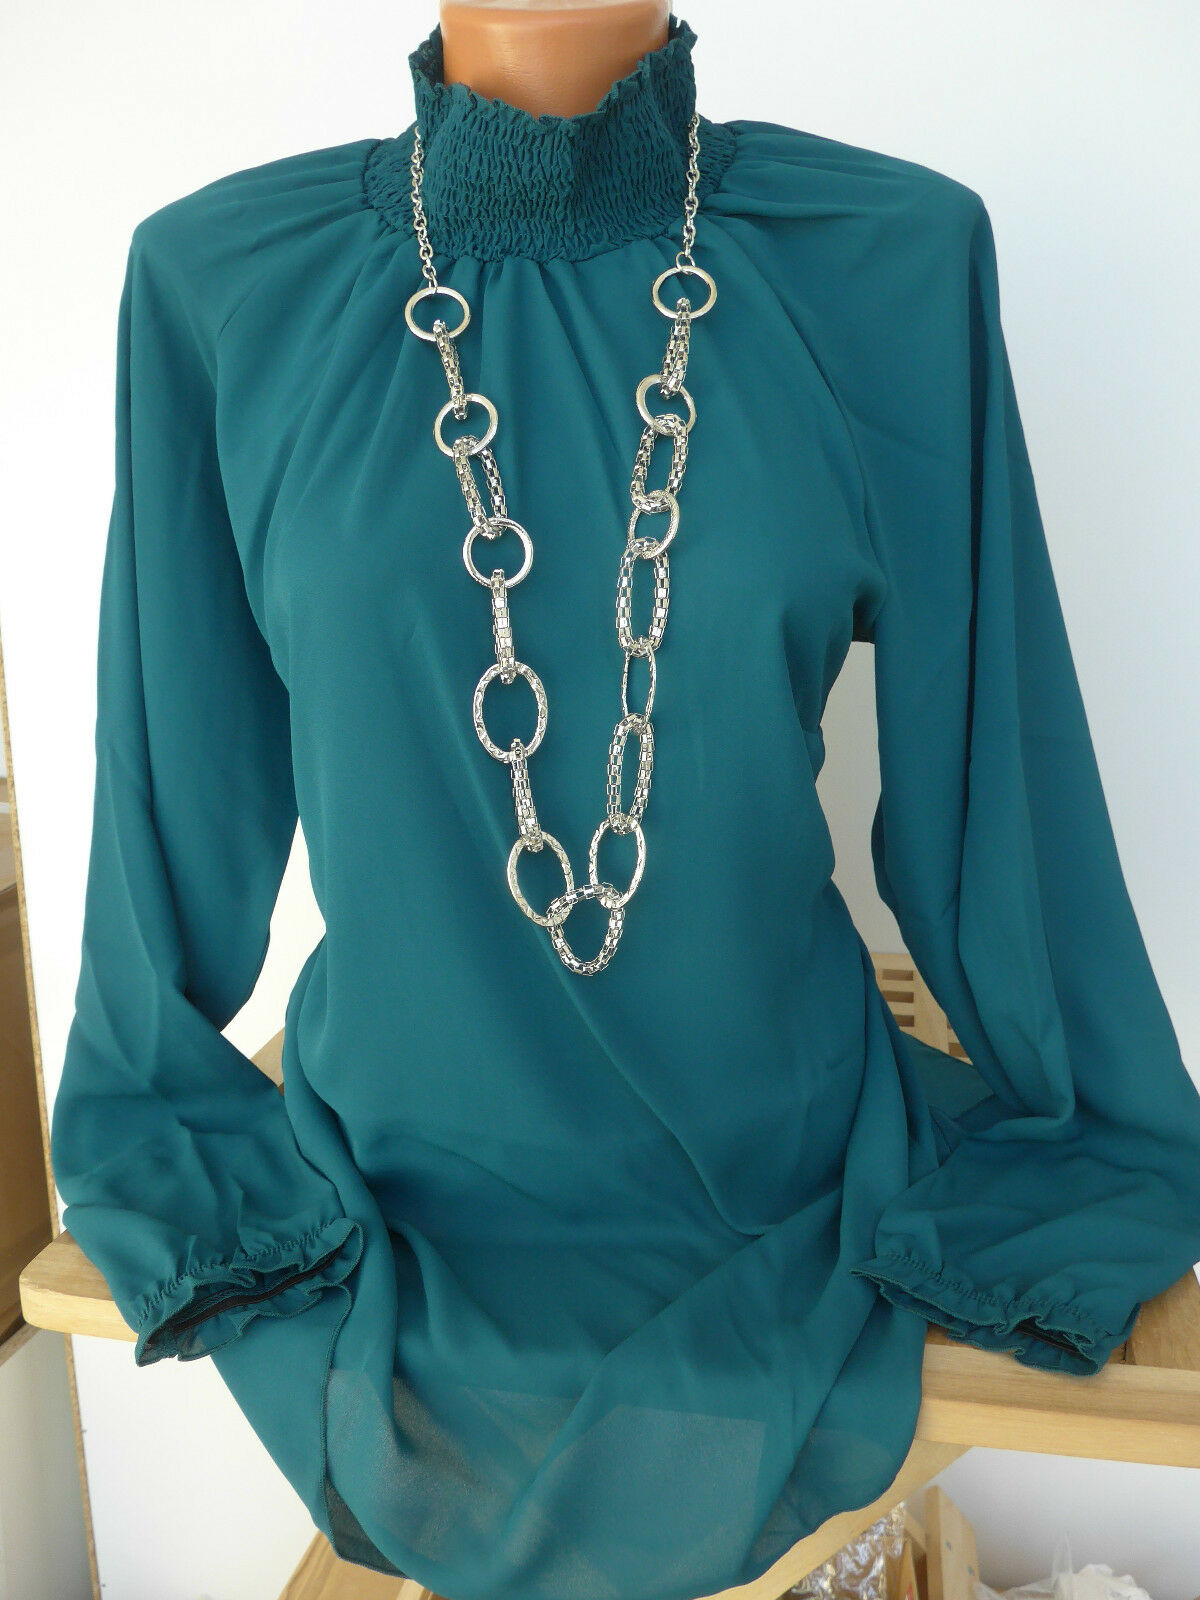 Sheego Tunika Bluse Shirt Gr. 40 - 52 mit hohem Kragen (874) Petrol NEU